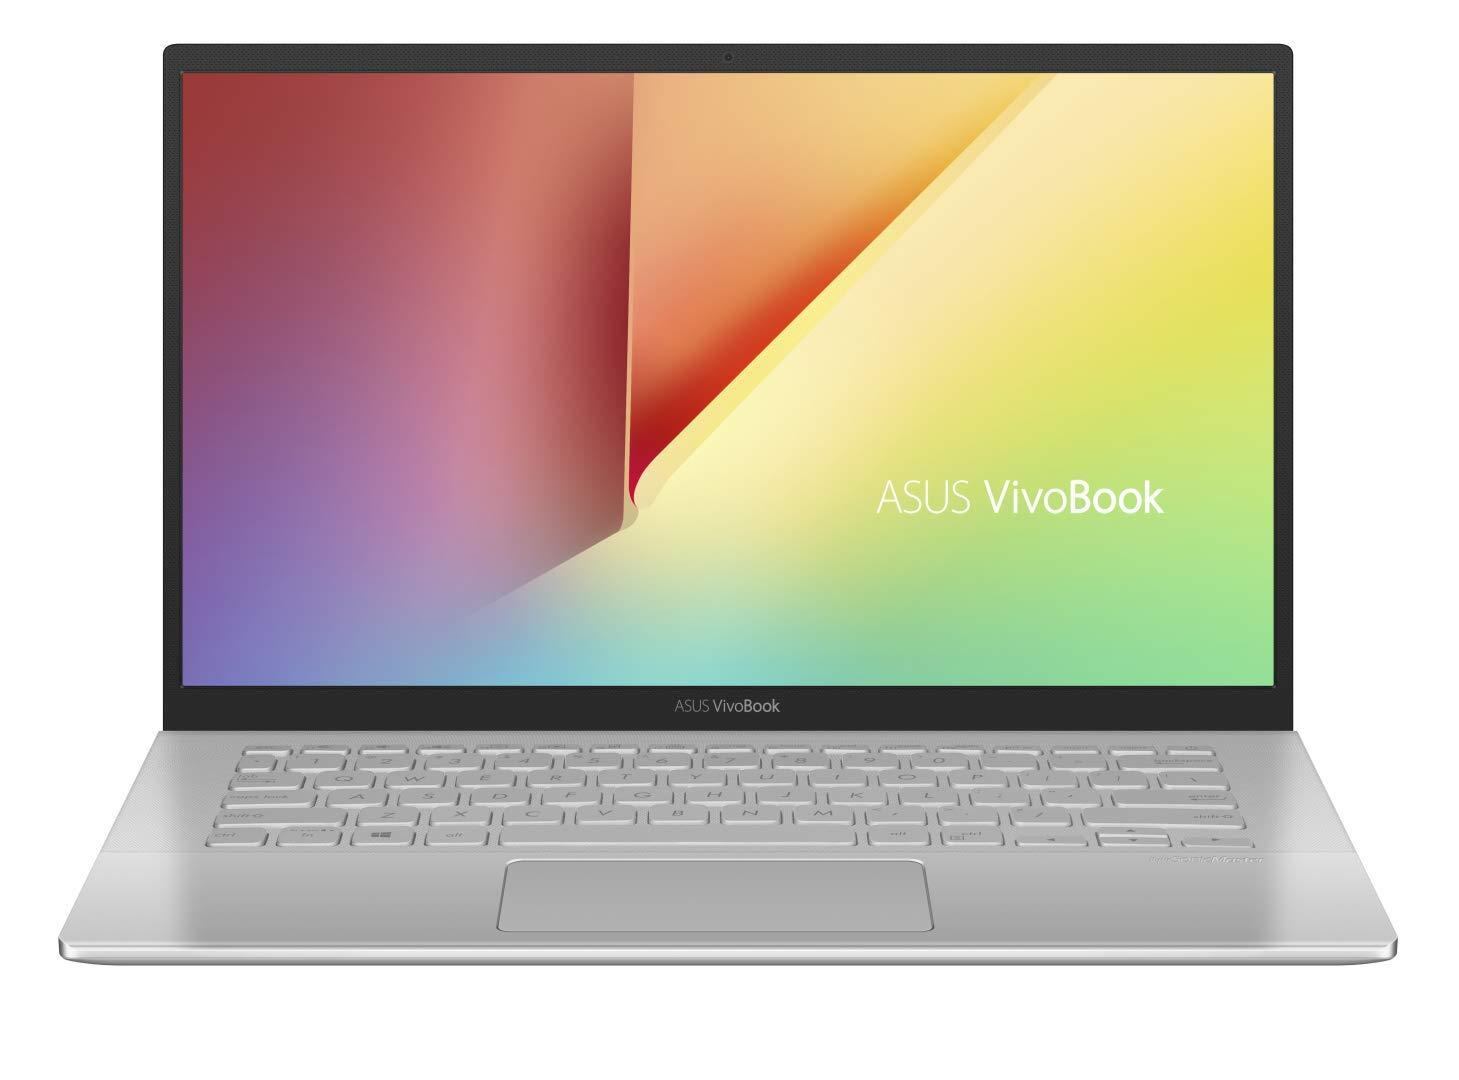 Ordinateur portable Asus VivoBook S412DA-EK005T Argent - AMD Ryzen, NumPad - photo 2